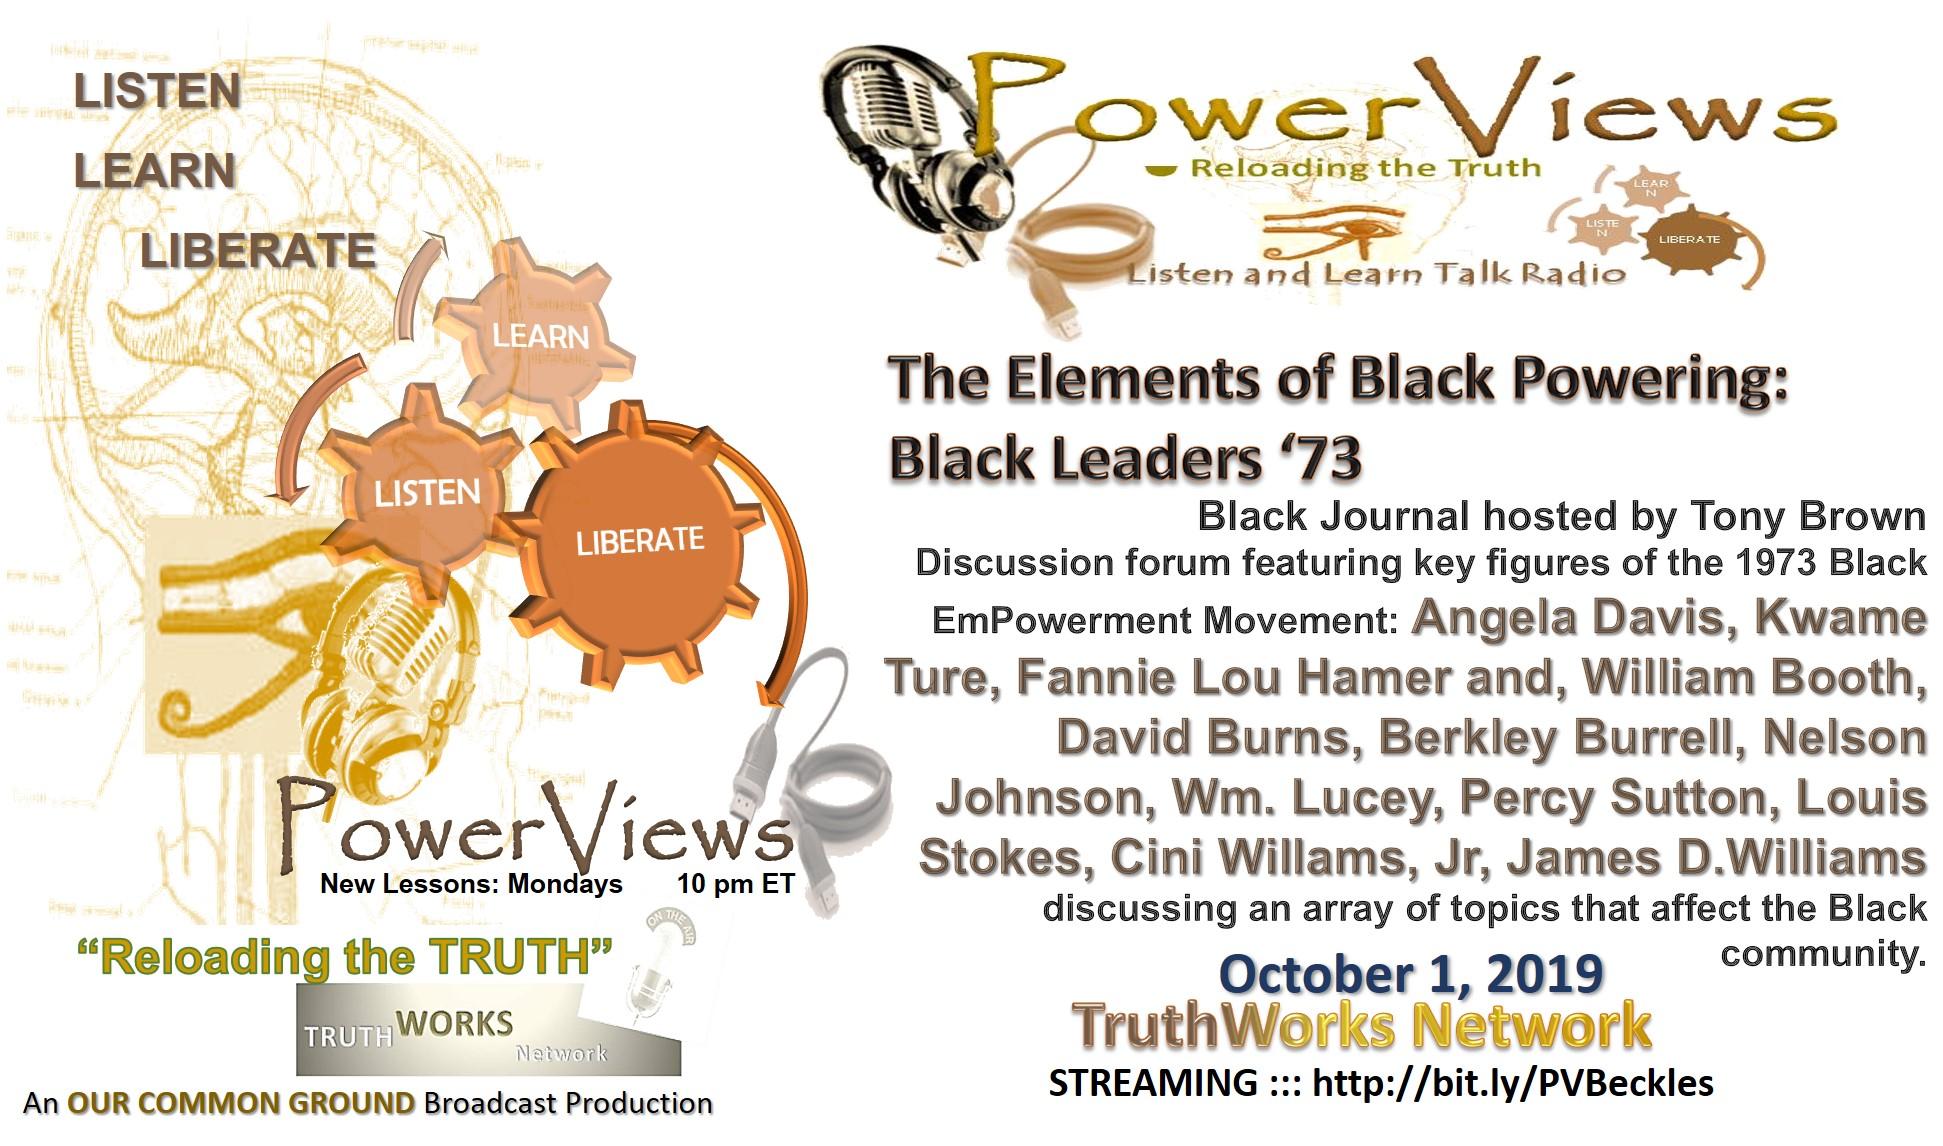 Black Empowerment 73 forum